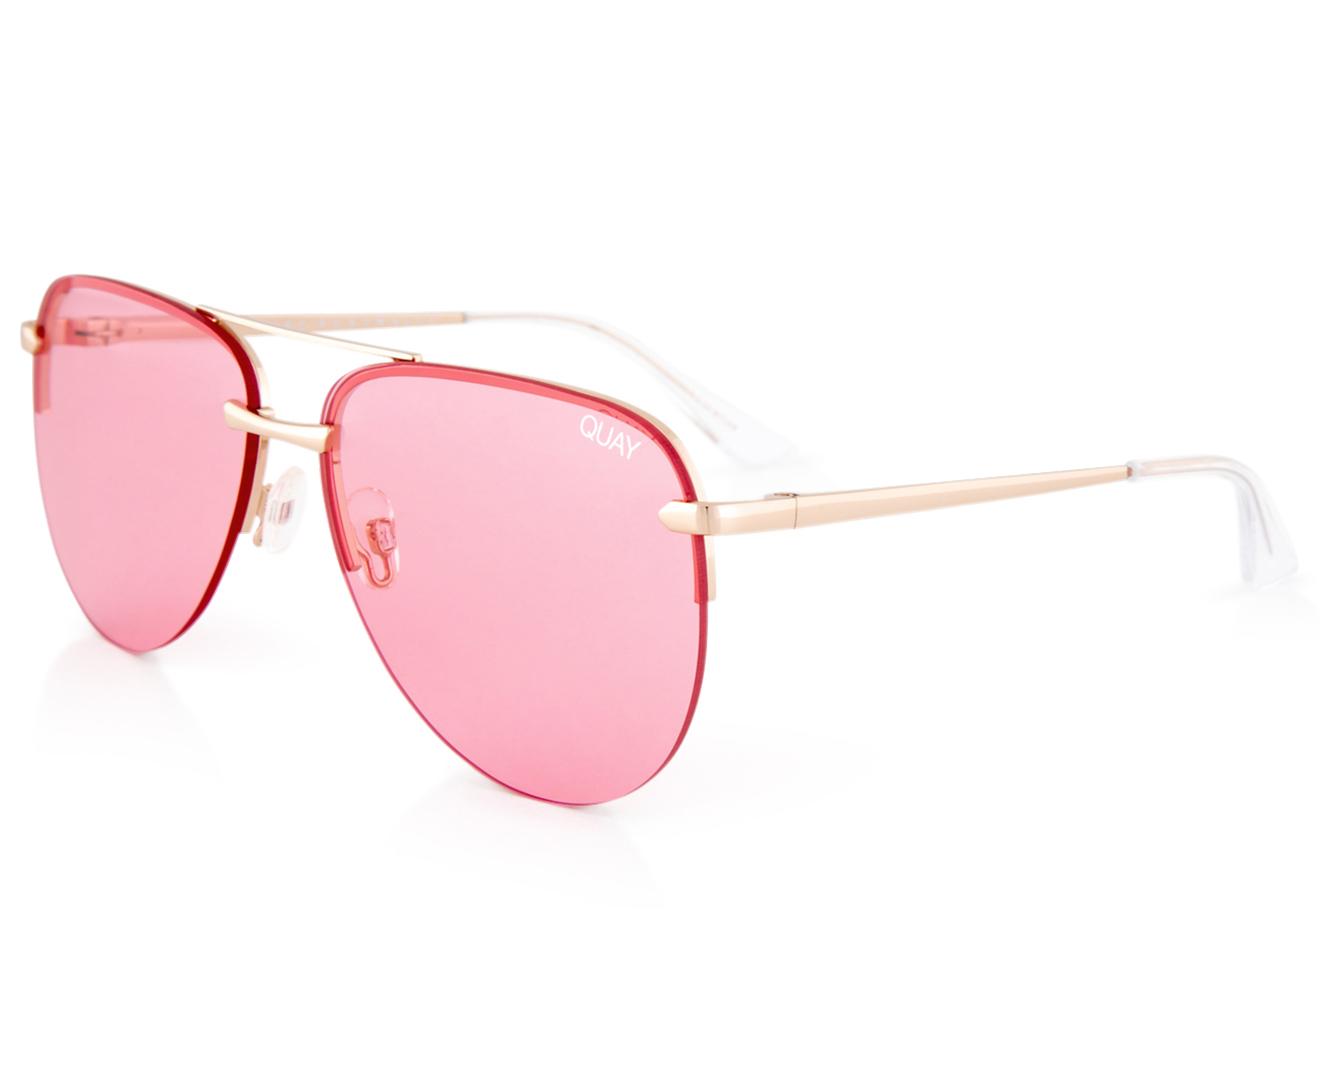 c7ff892c20d Quay Australia Women s The Playa Sunglasses - Rose Gold Pink ...